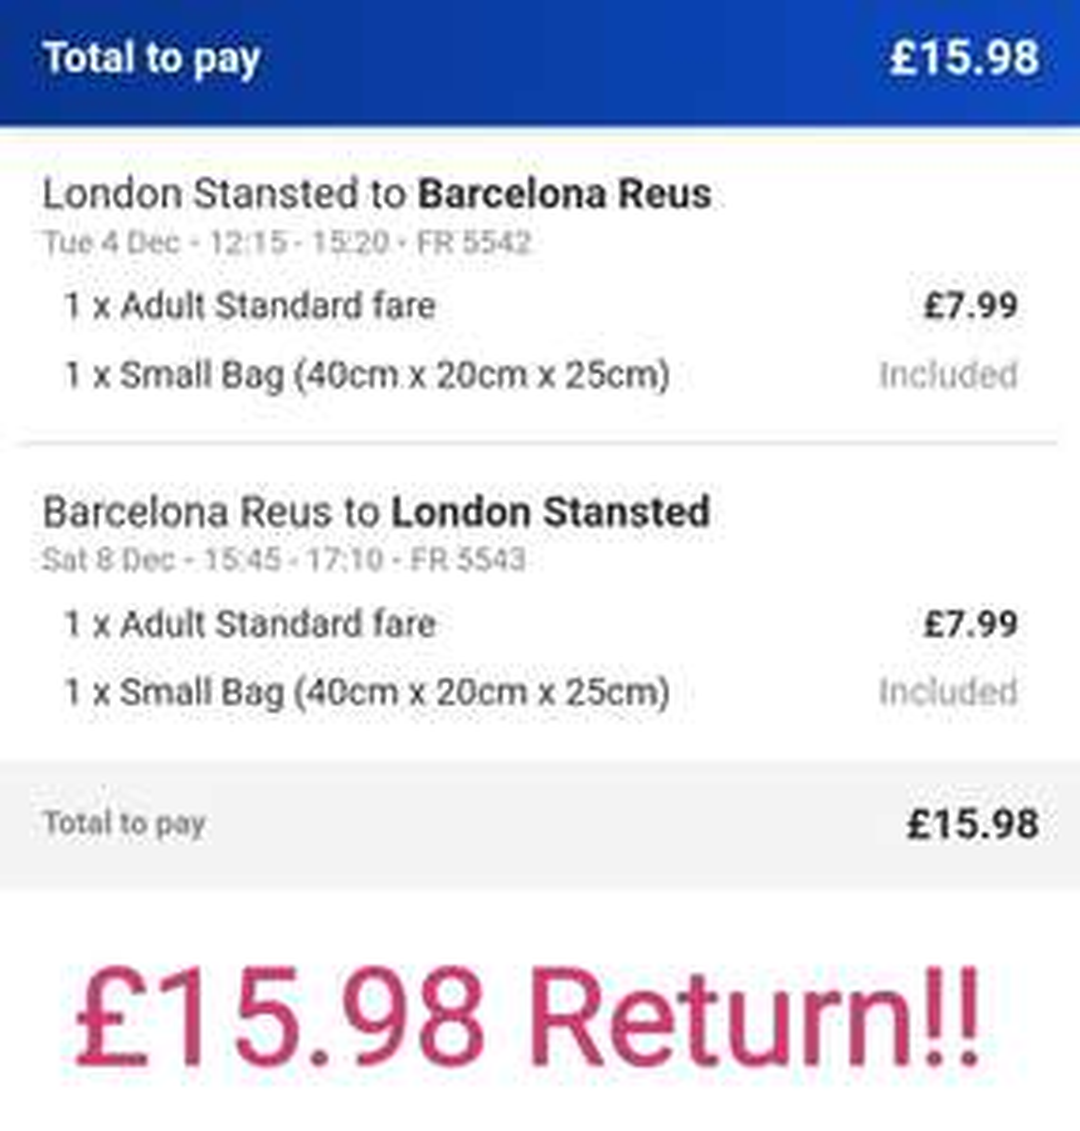 London (Essex, UK) to Reus (Catalonia, Spain) four day return £15.98 at Ryanair